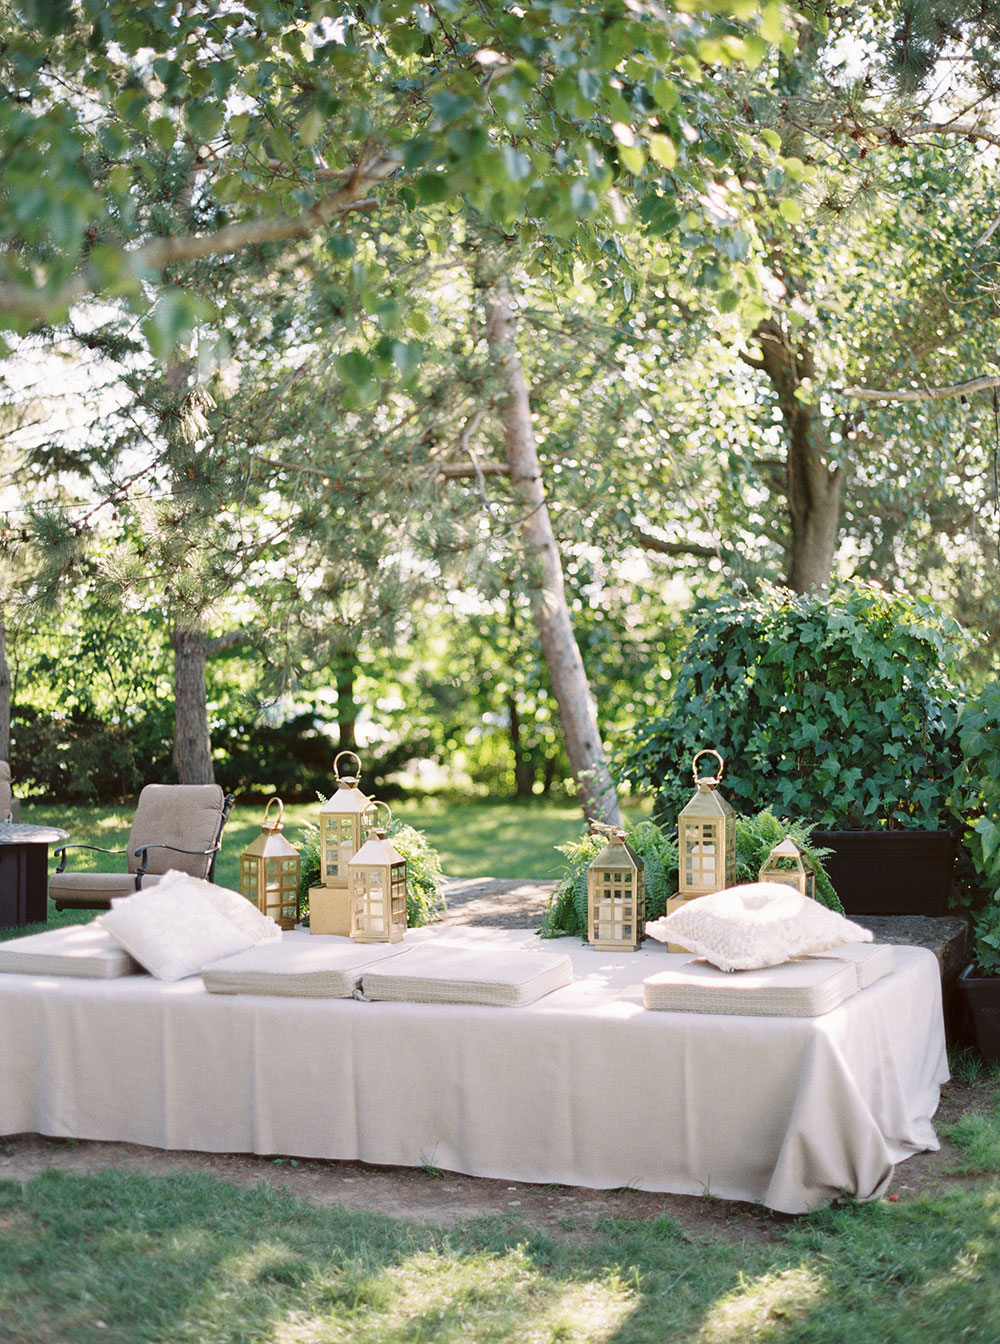 kurtz-orchards-wedding-gracewood-estate-niagara-on-the-lake-photo-by-katie-nicolle-photography-0067.JPG